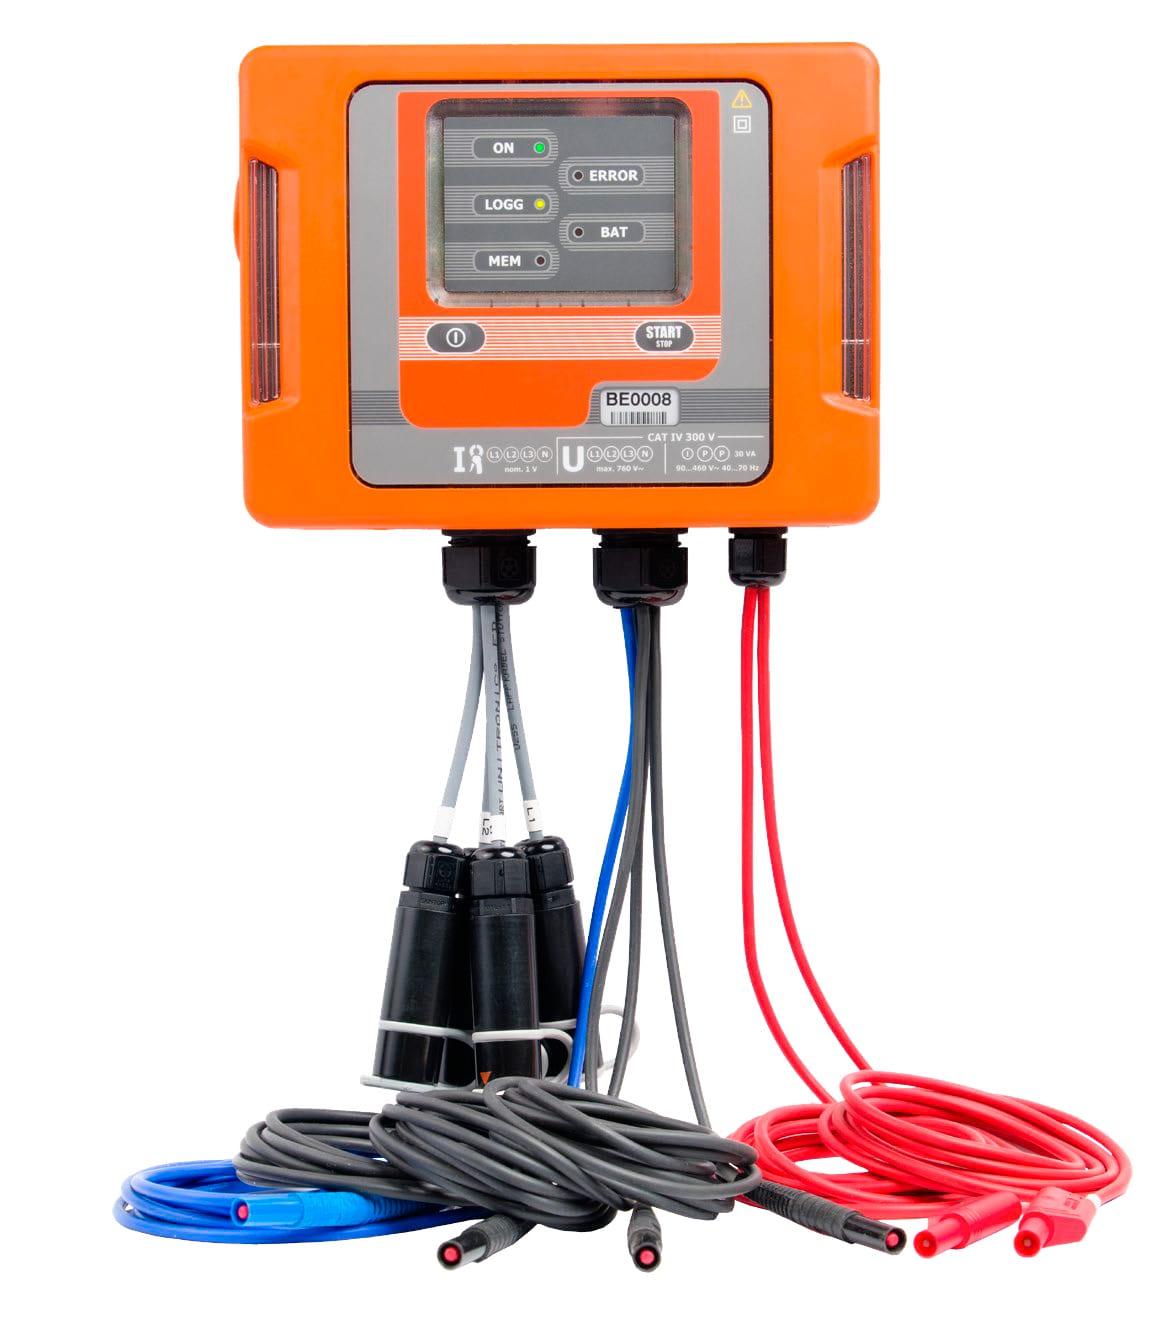 Analisador de Qualidade de Energia APQM-700